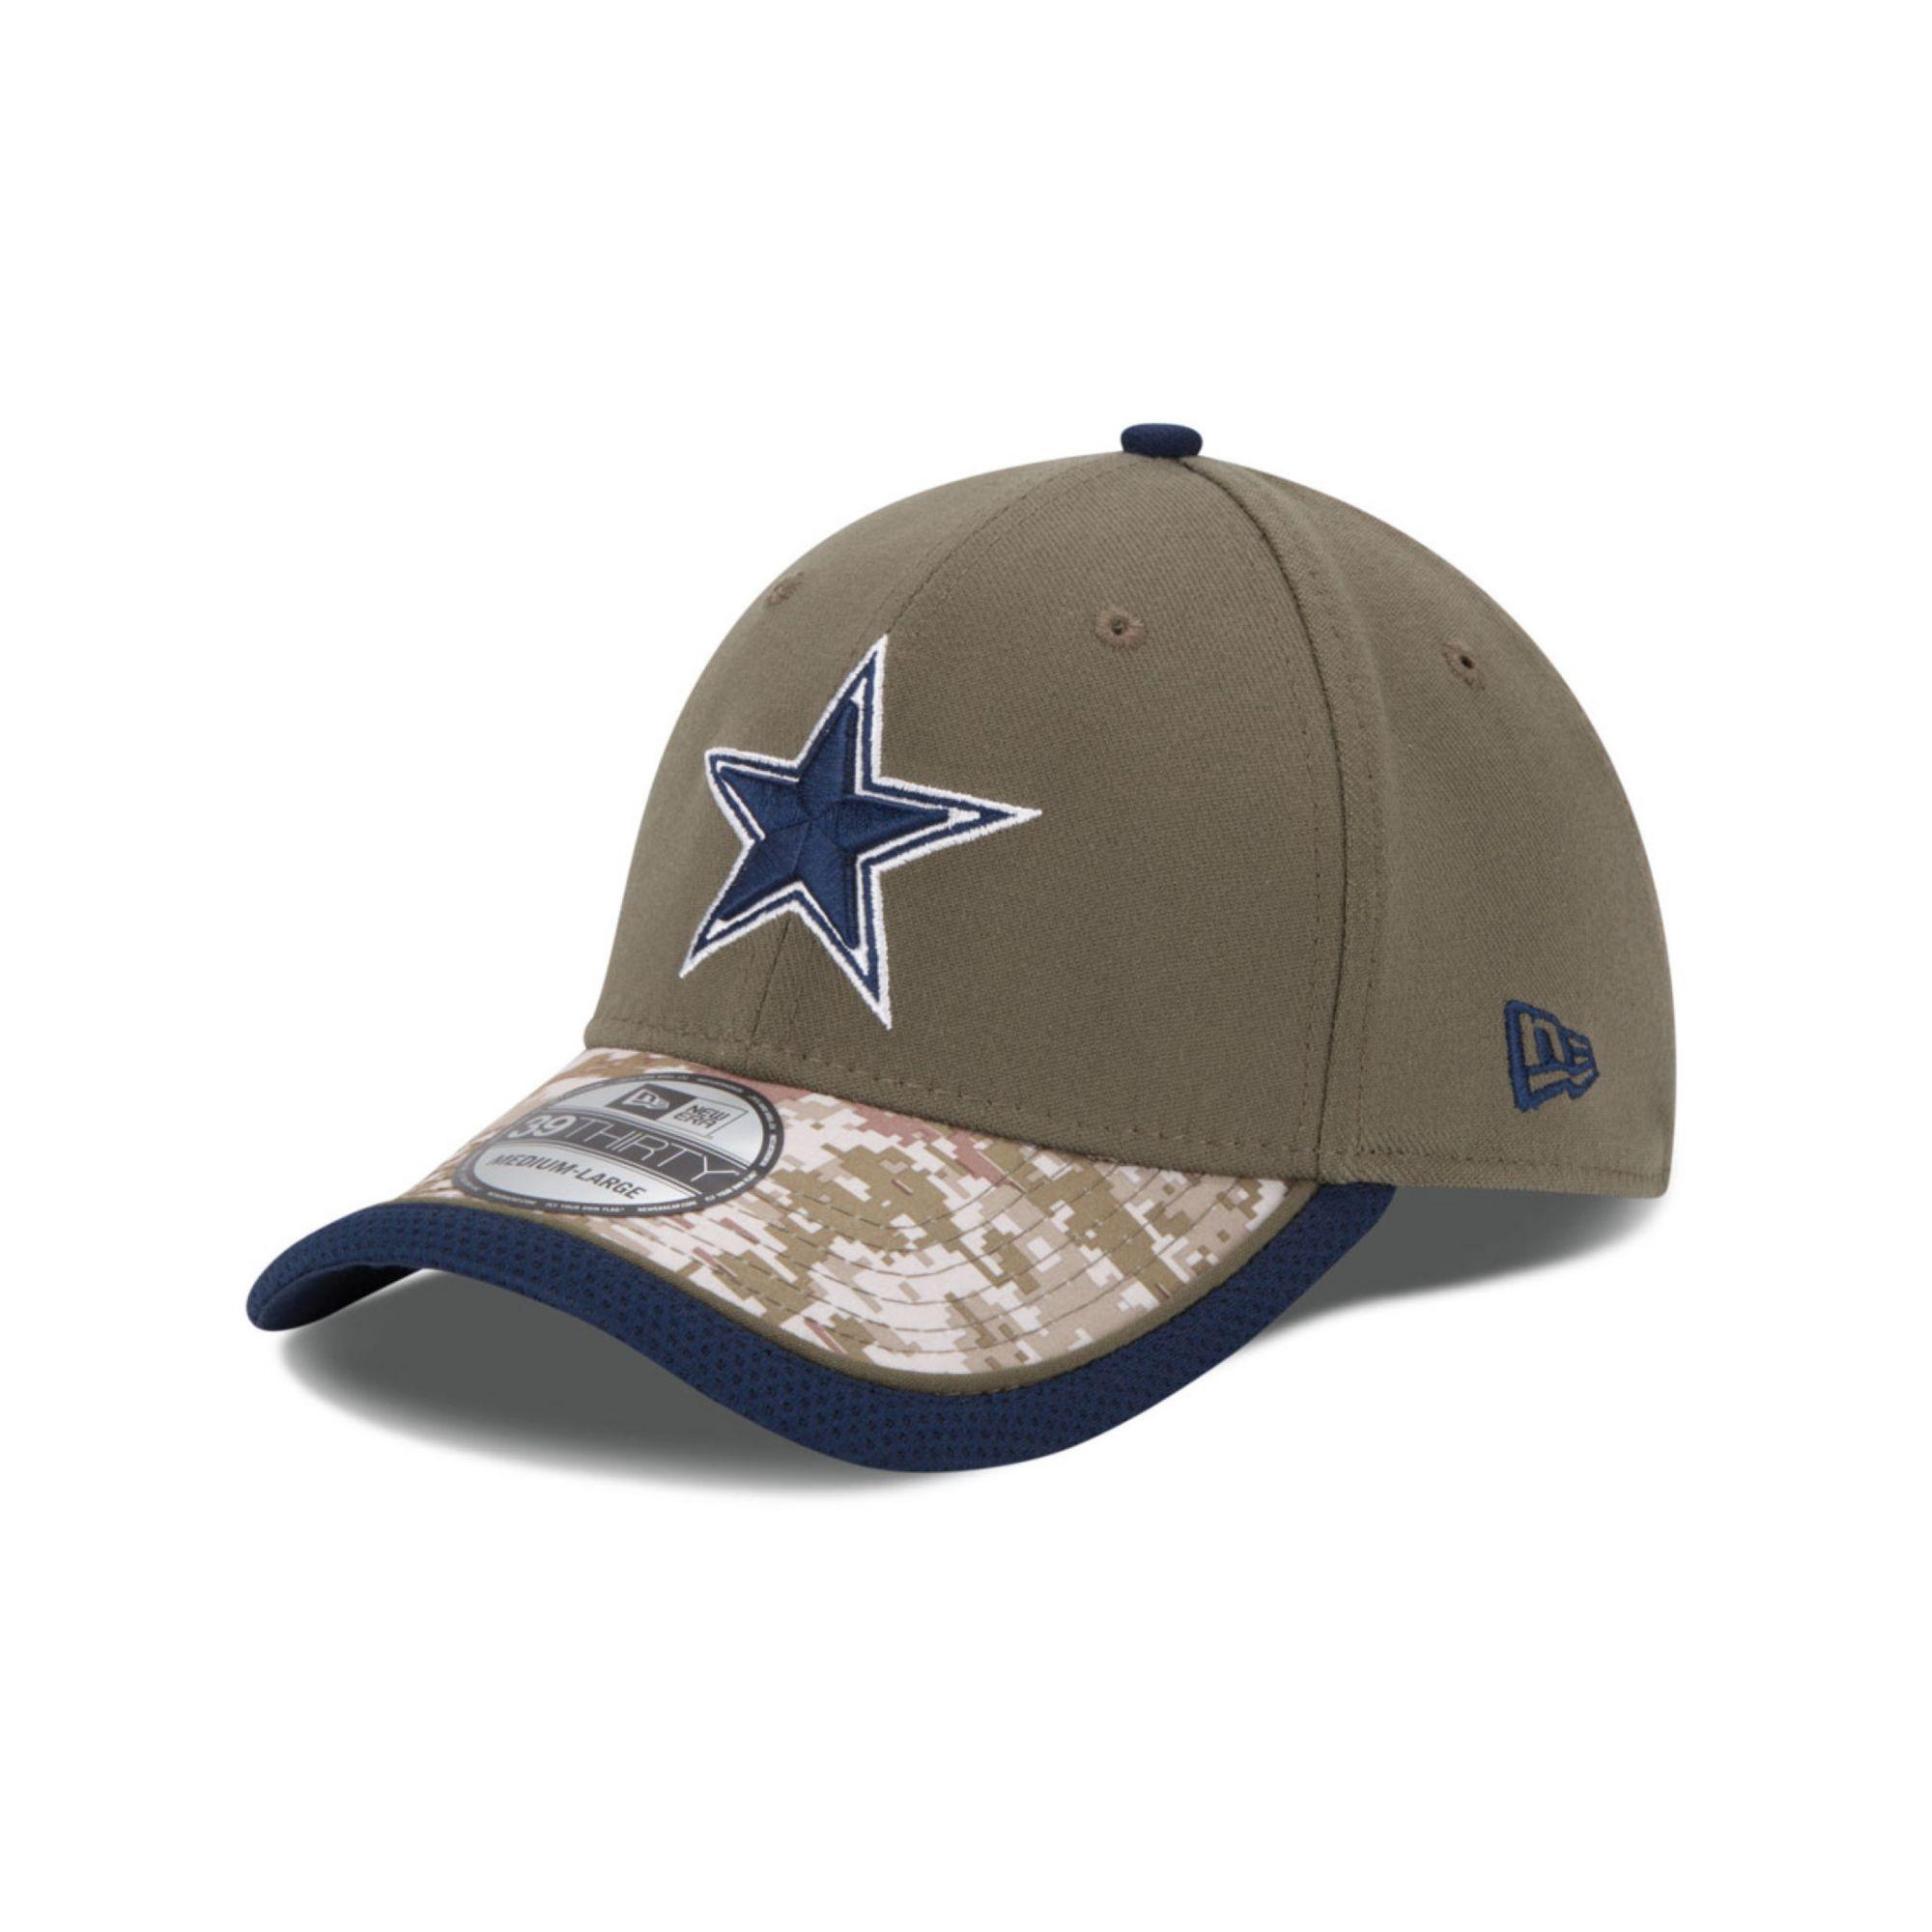 1de2d957 real dallas cowboys camouflage cap ddde1 4ff83